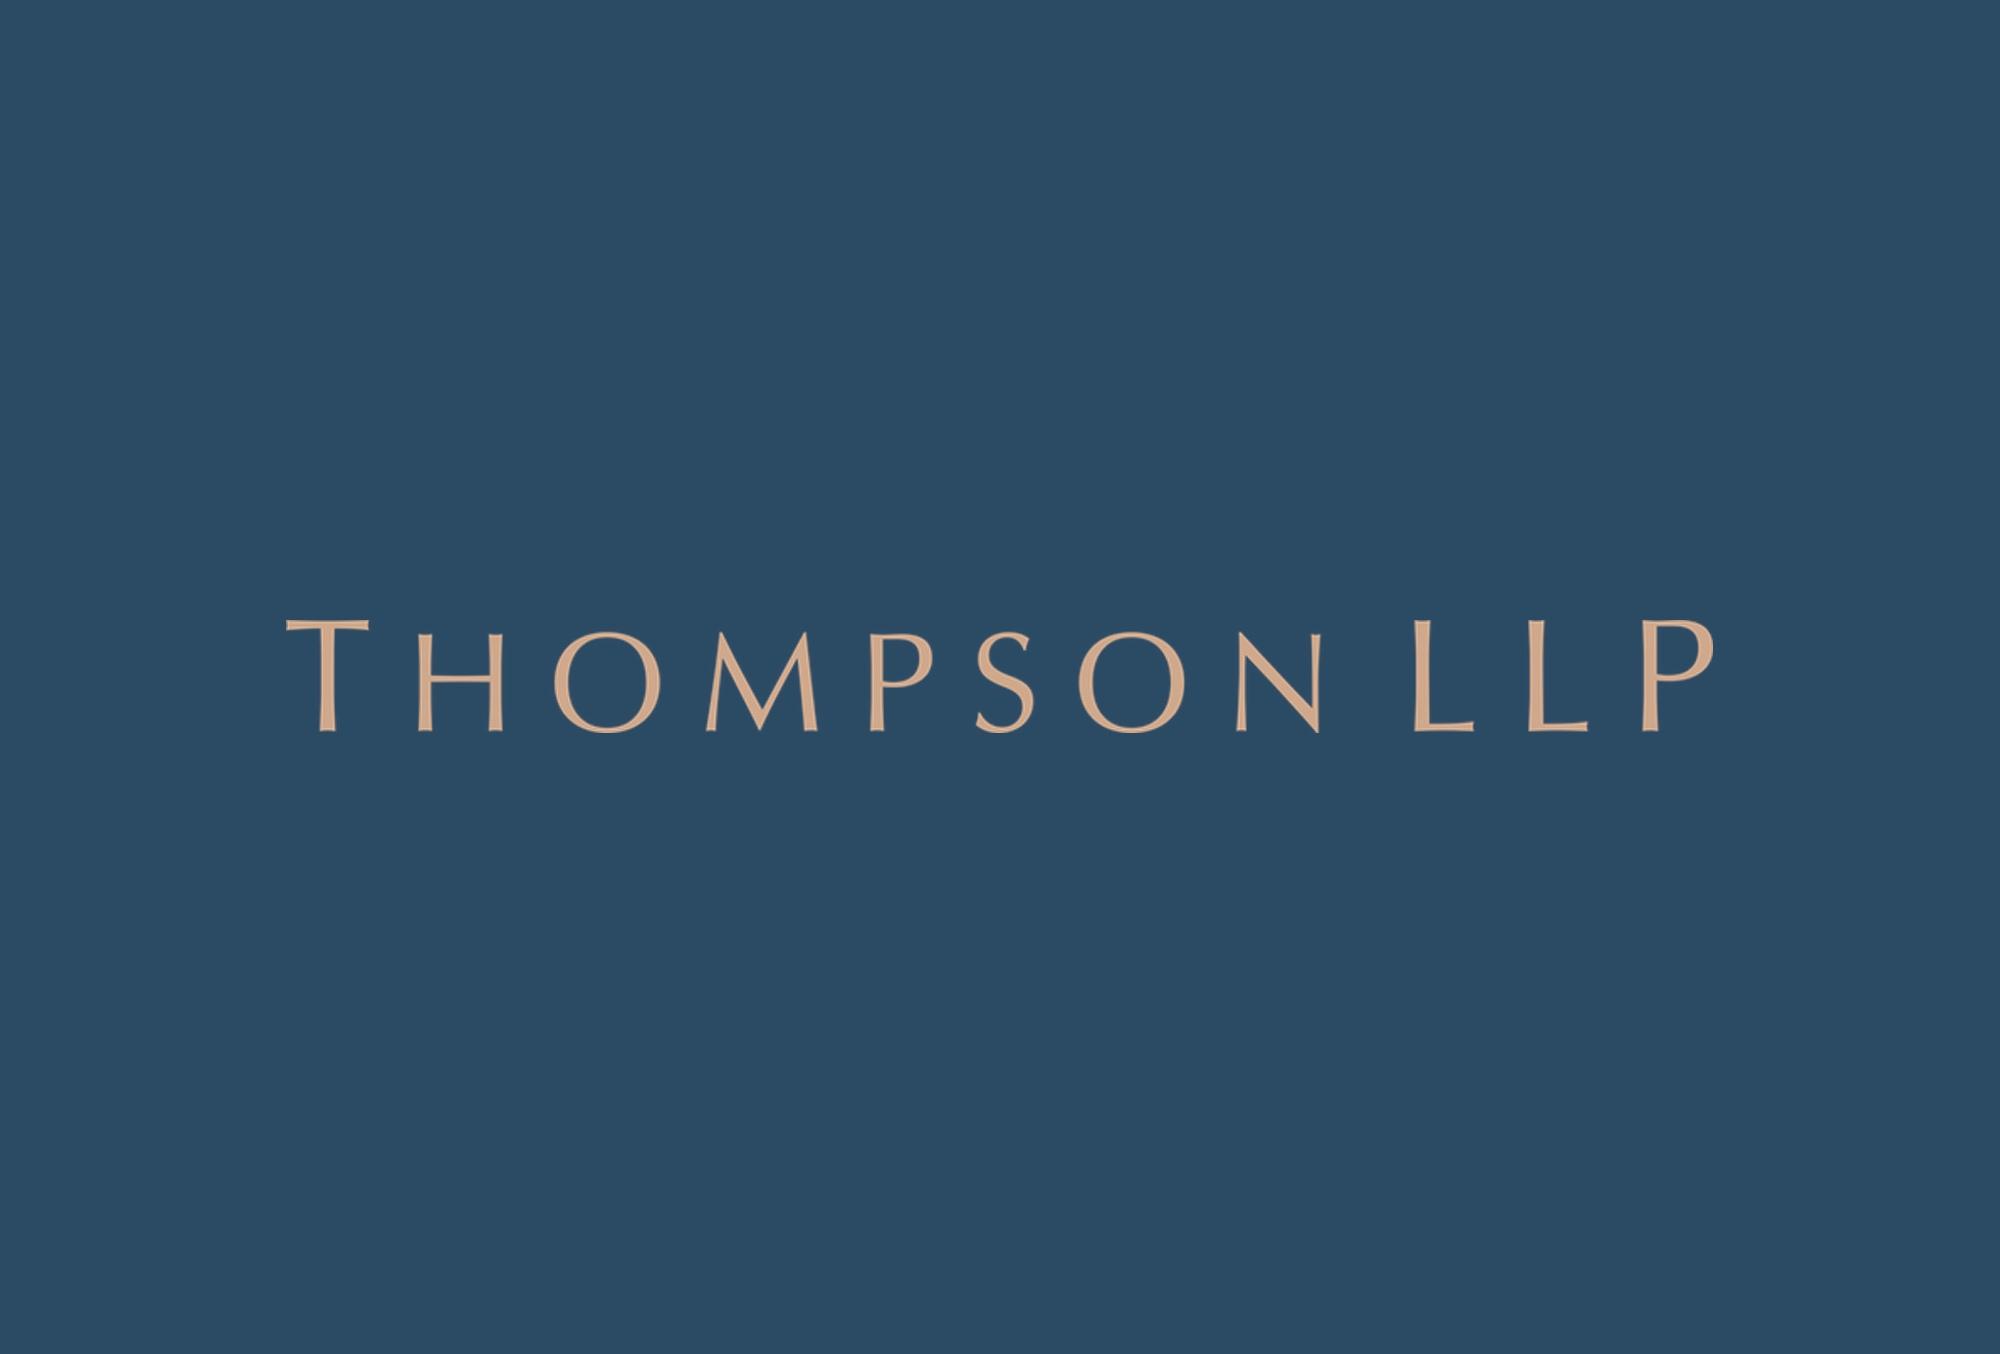 Thompson LLP